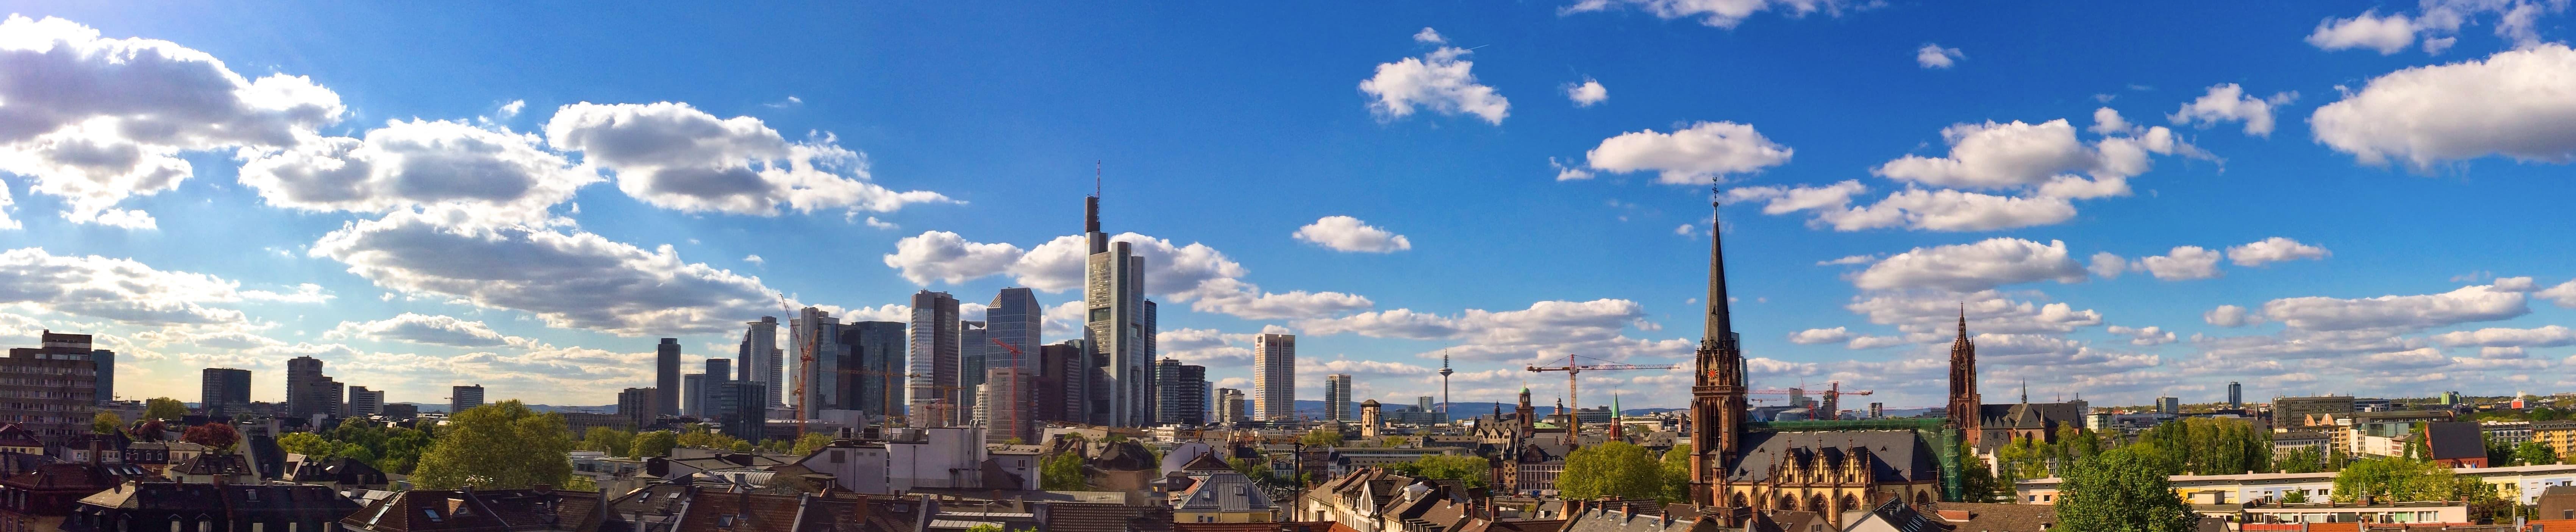 Verlagsrecht Anwälte Kanzlei WeSaveYourCopyrights Rechtsanwaltsgesellschaft mbH Frankfurt am Main Skyline